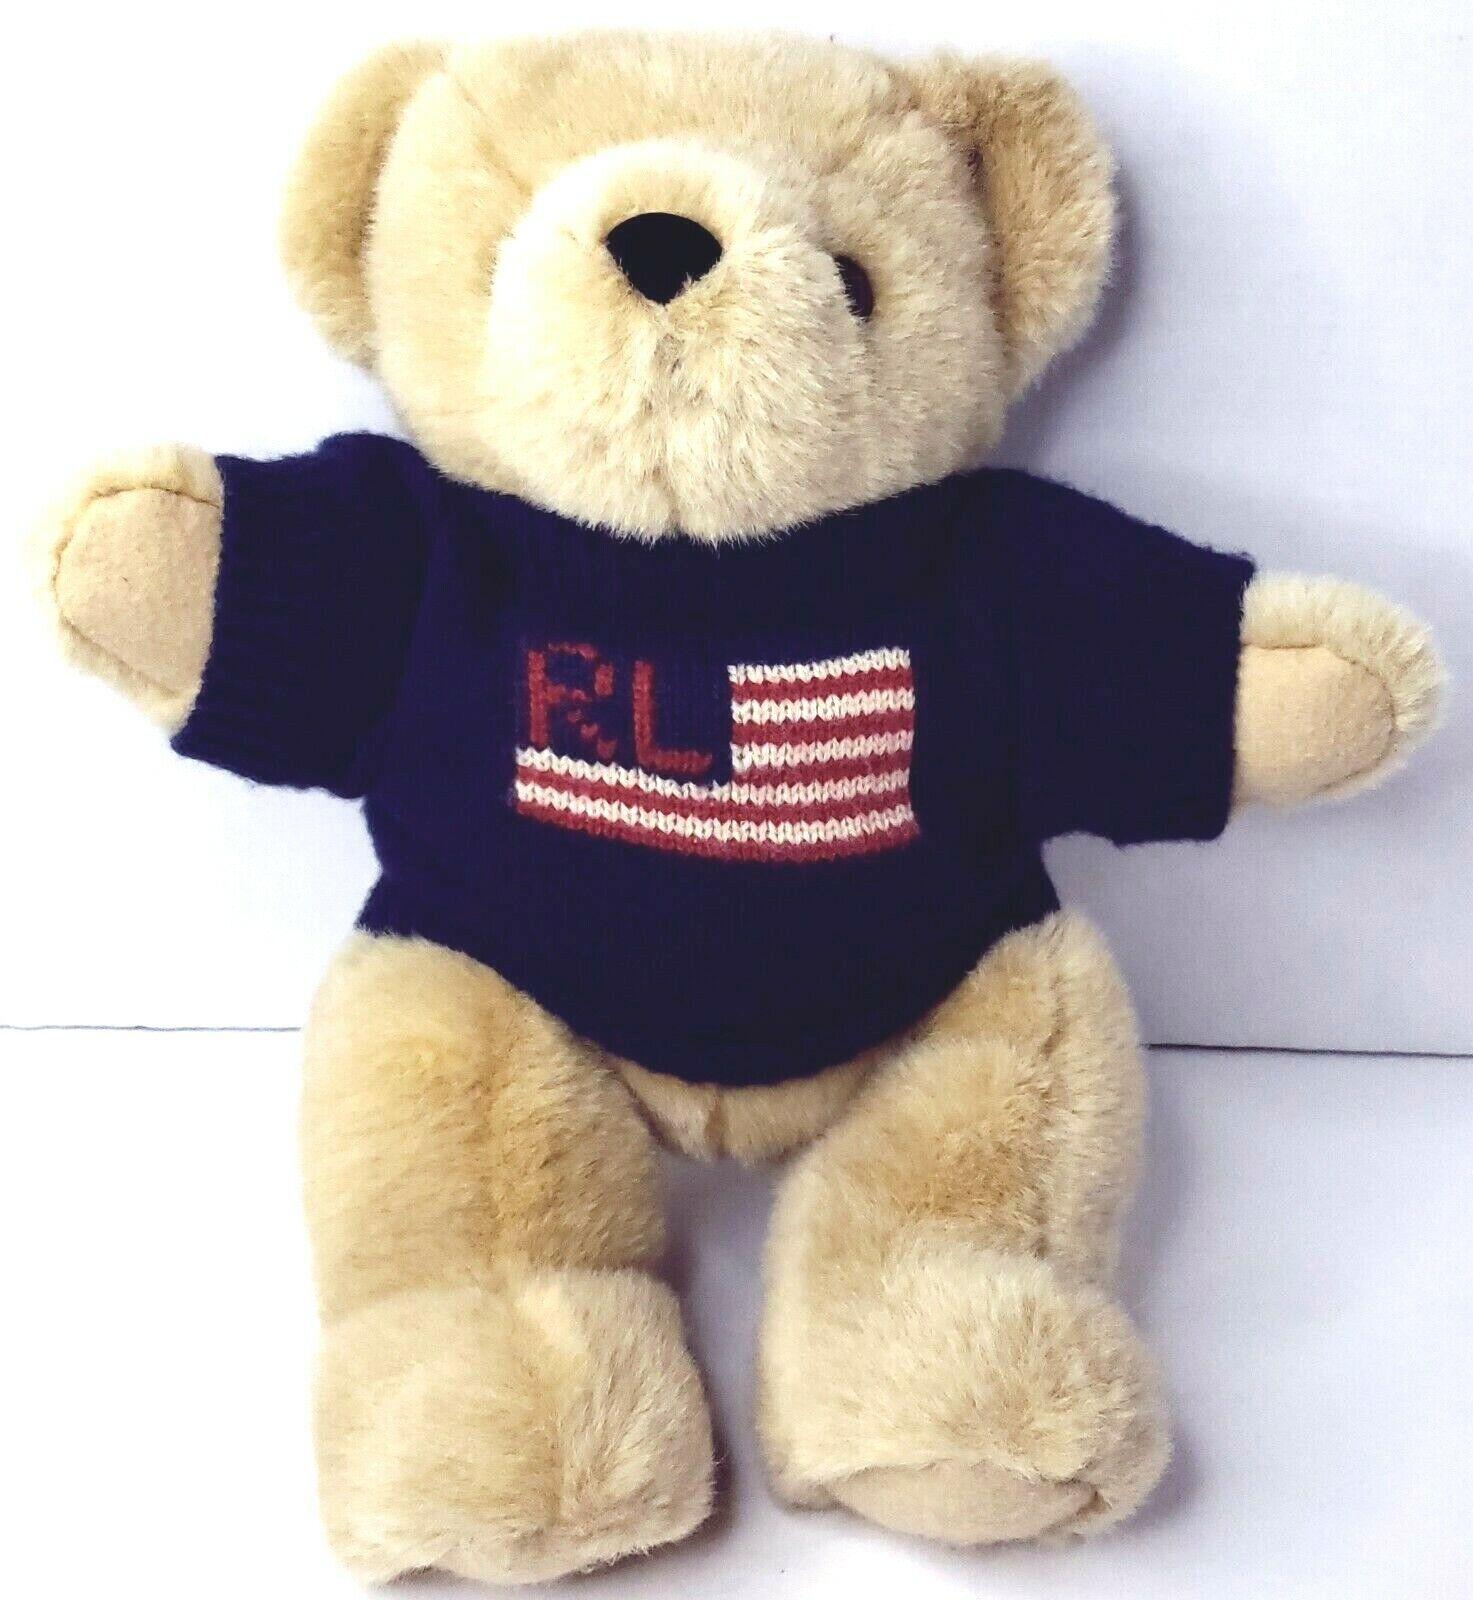 ralph lauren polo teddy bear Limit